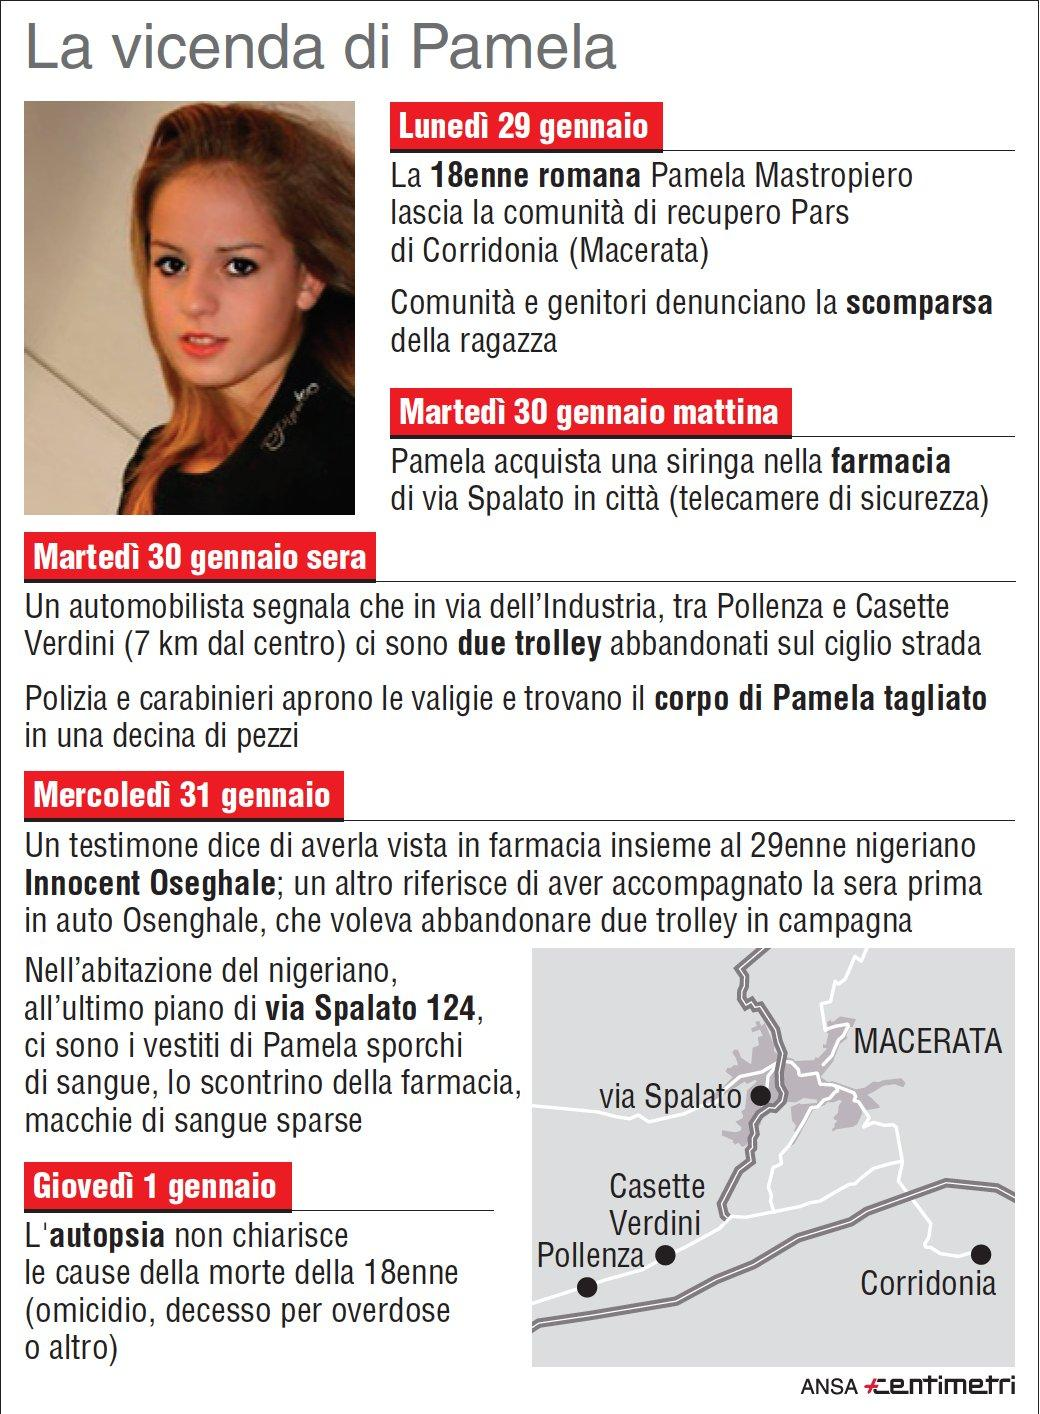 Pamela Mastropietro, cosa è successo